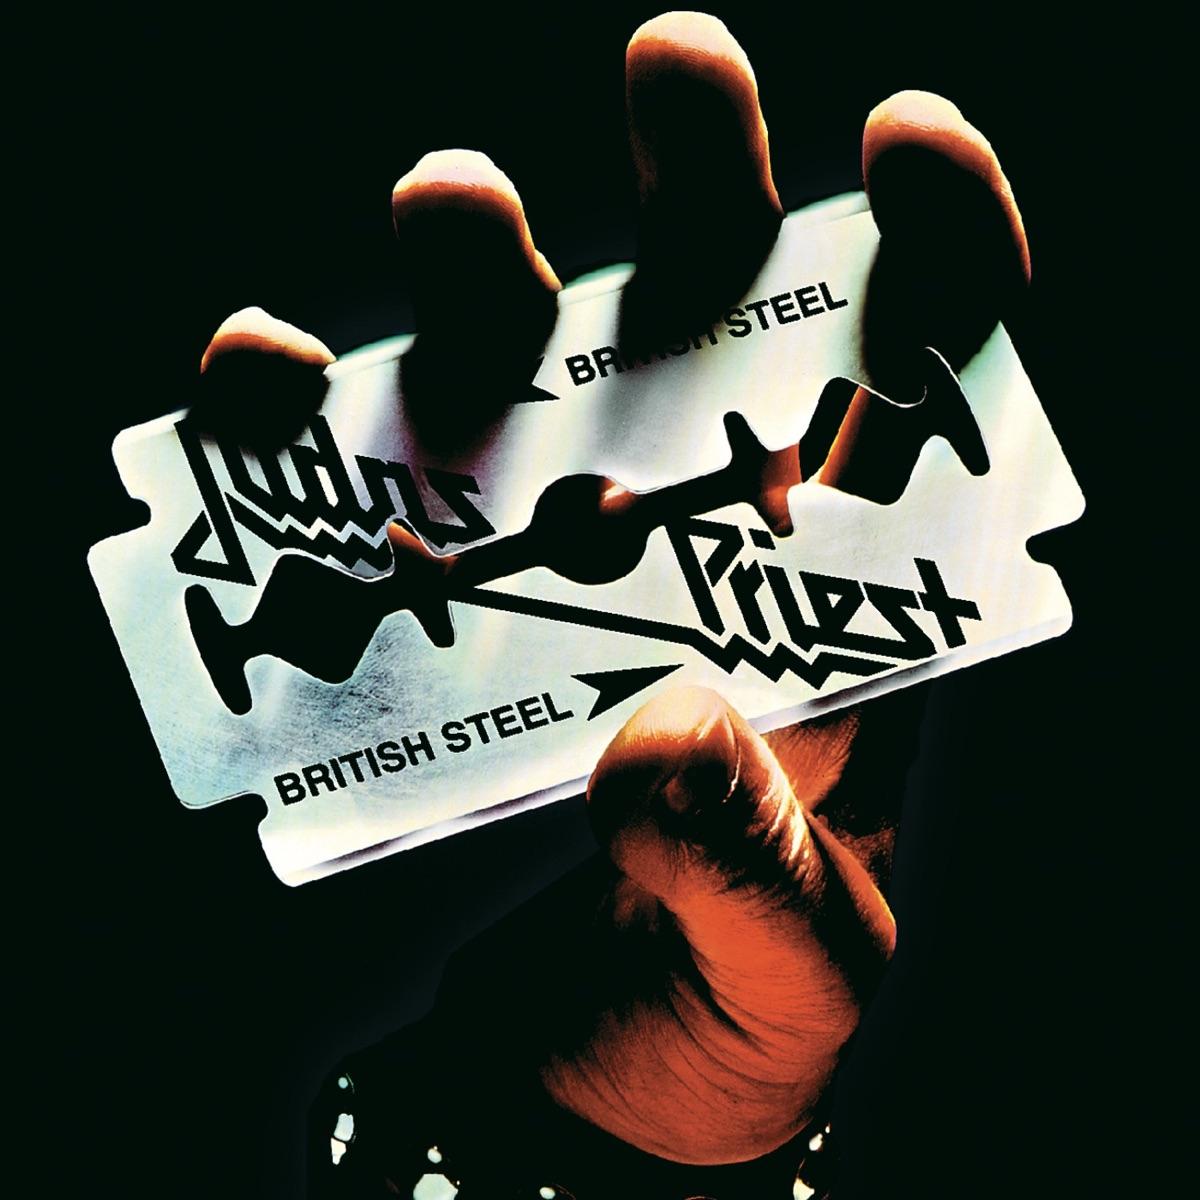 British Steel Judas Priest CD cover